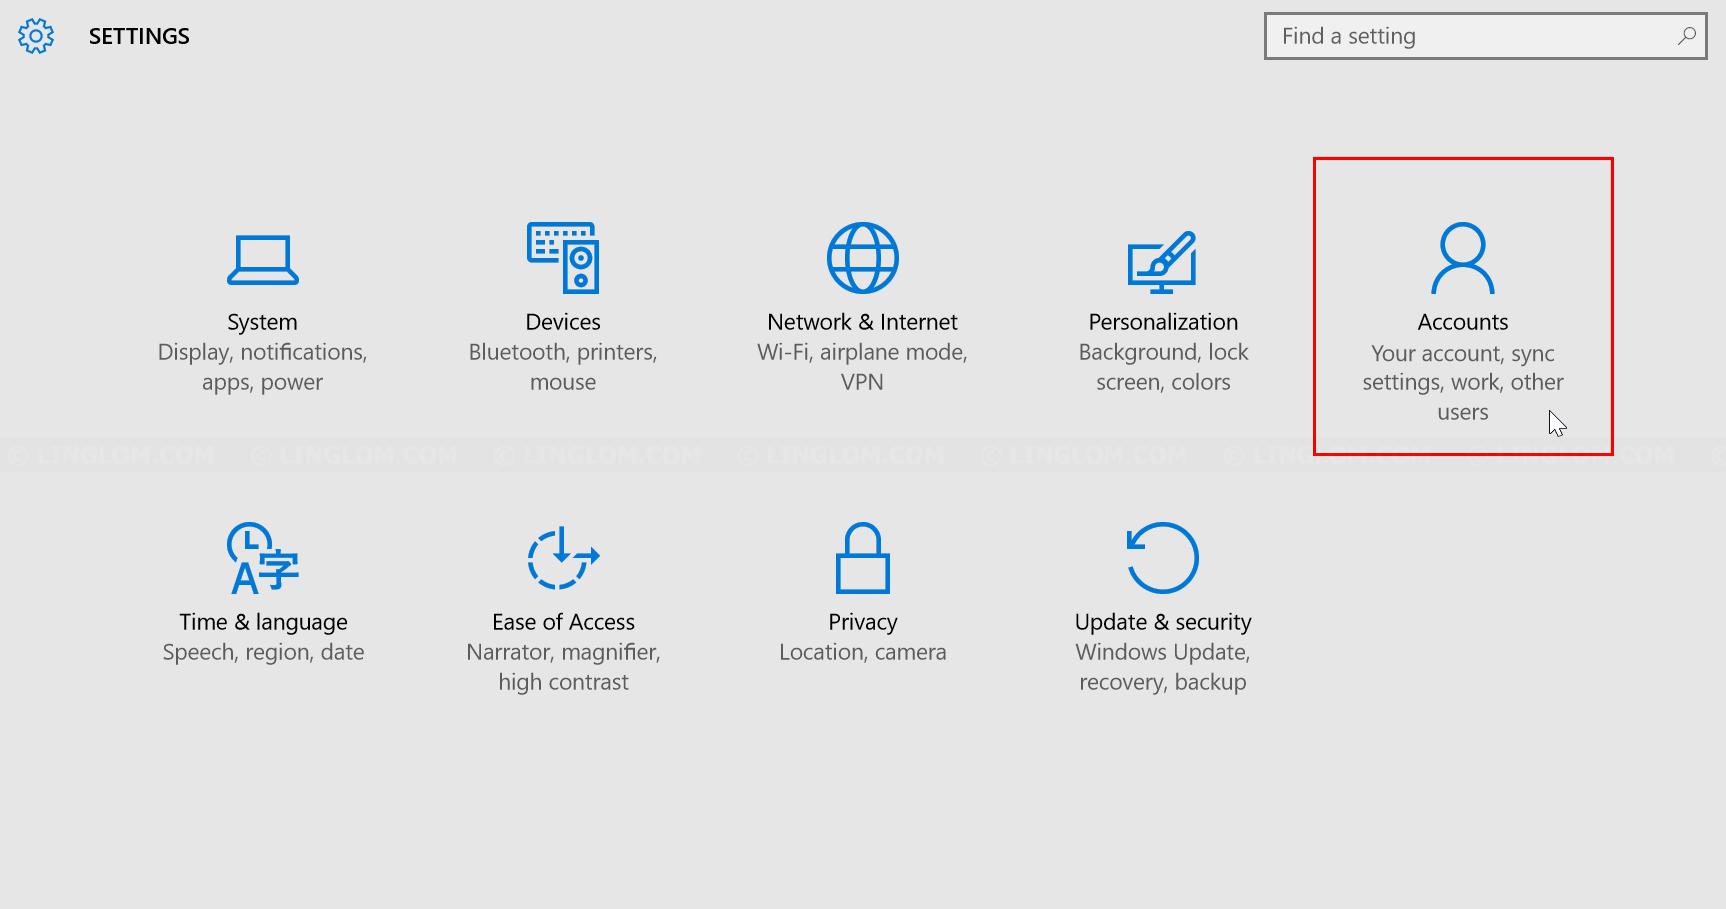 Open Accounts settings